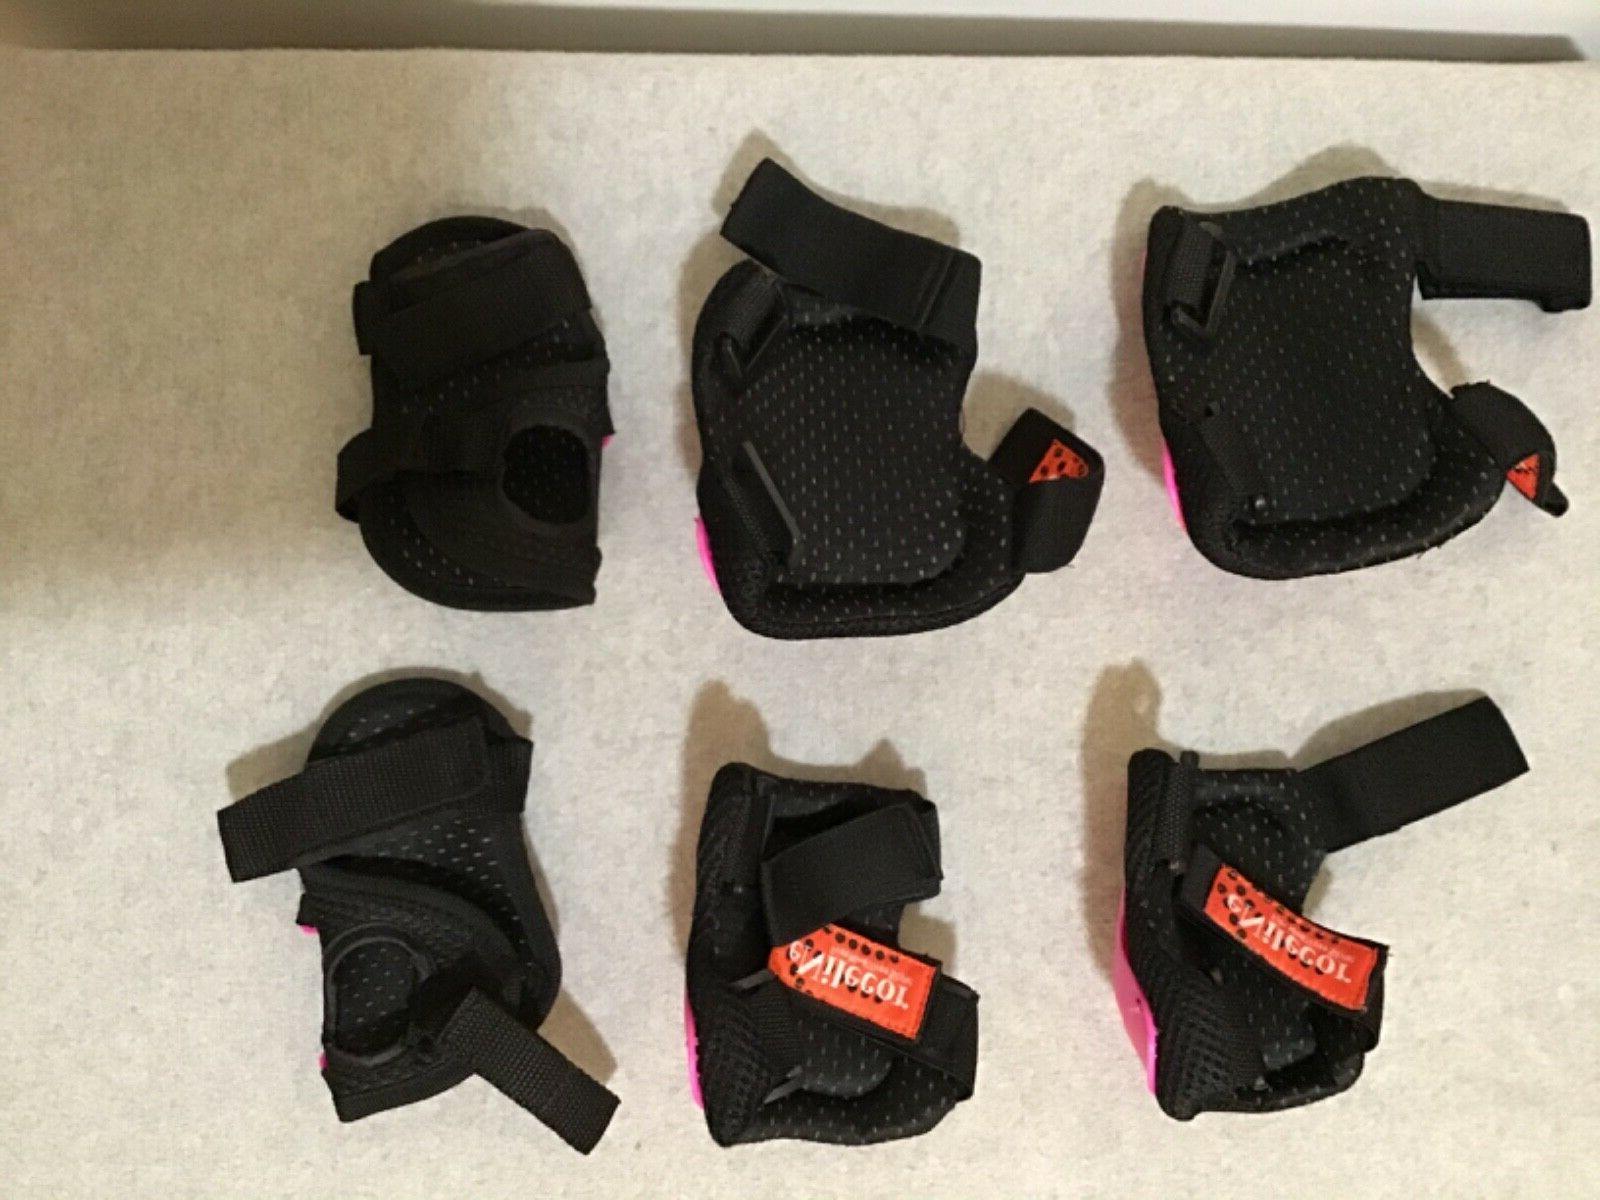 eNilecor Protective Pad 6 Black/Pink NEW